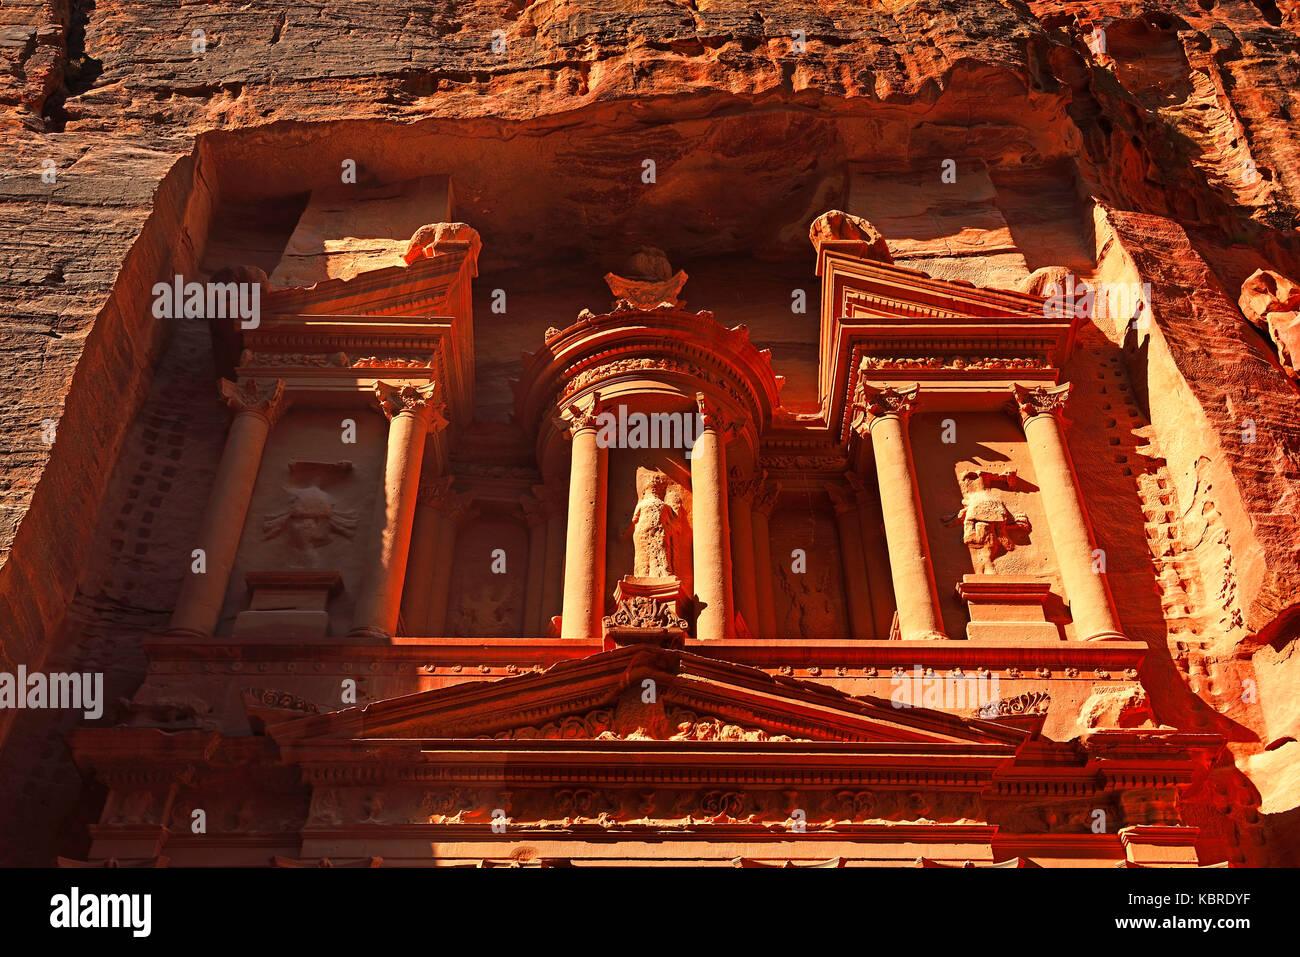 Khazne al Firaun, Al Khazneh treasury building, Petra, Wadi Musa, Jordan - Stock Image